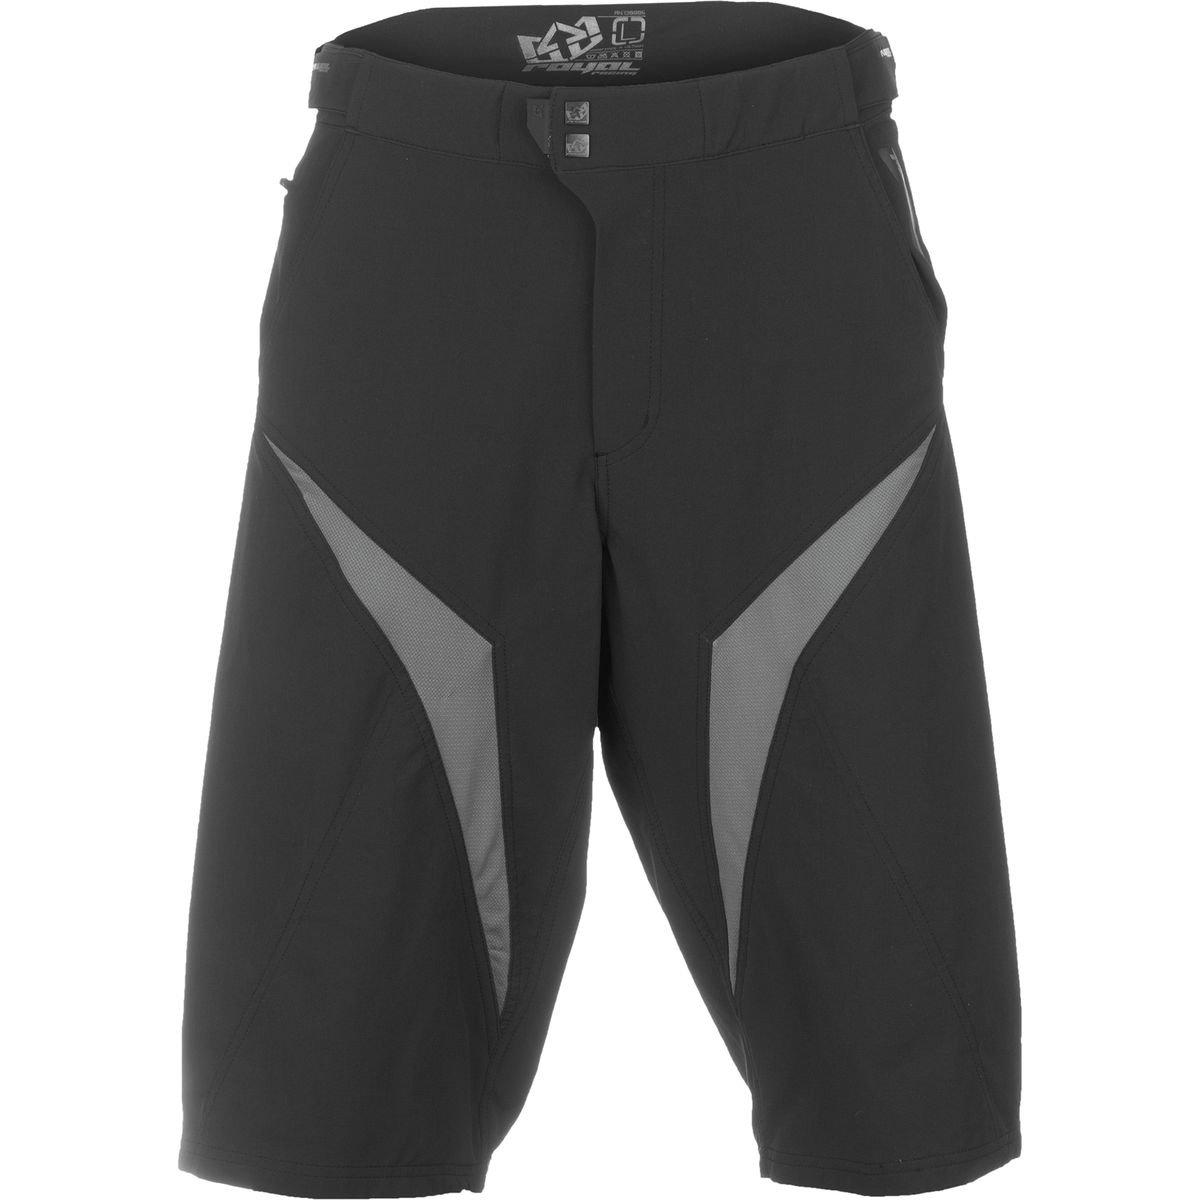 Royal Racing Esquire  Shorts, Black, XX-Large